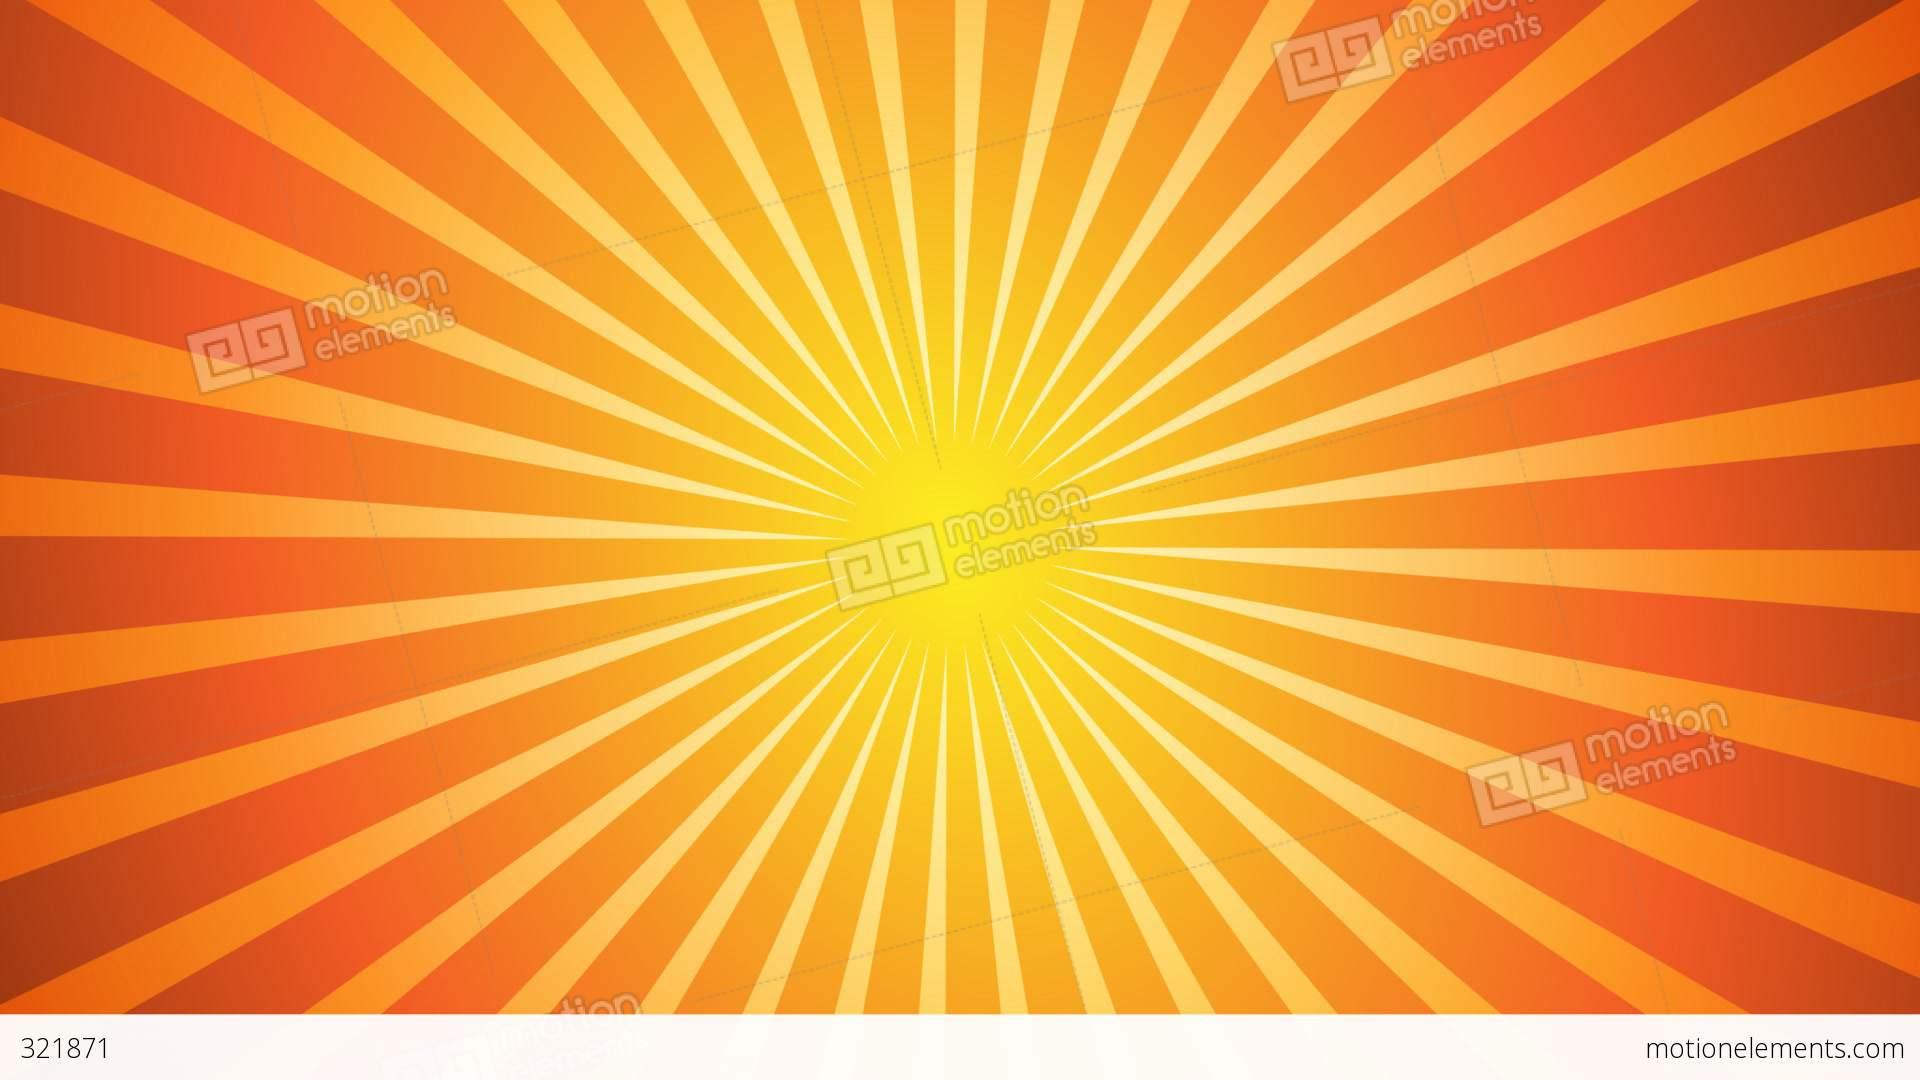 Earth Animated Wallpaper Hot Sunburst Background Stock Animation 321871